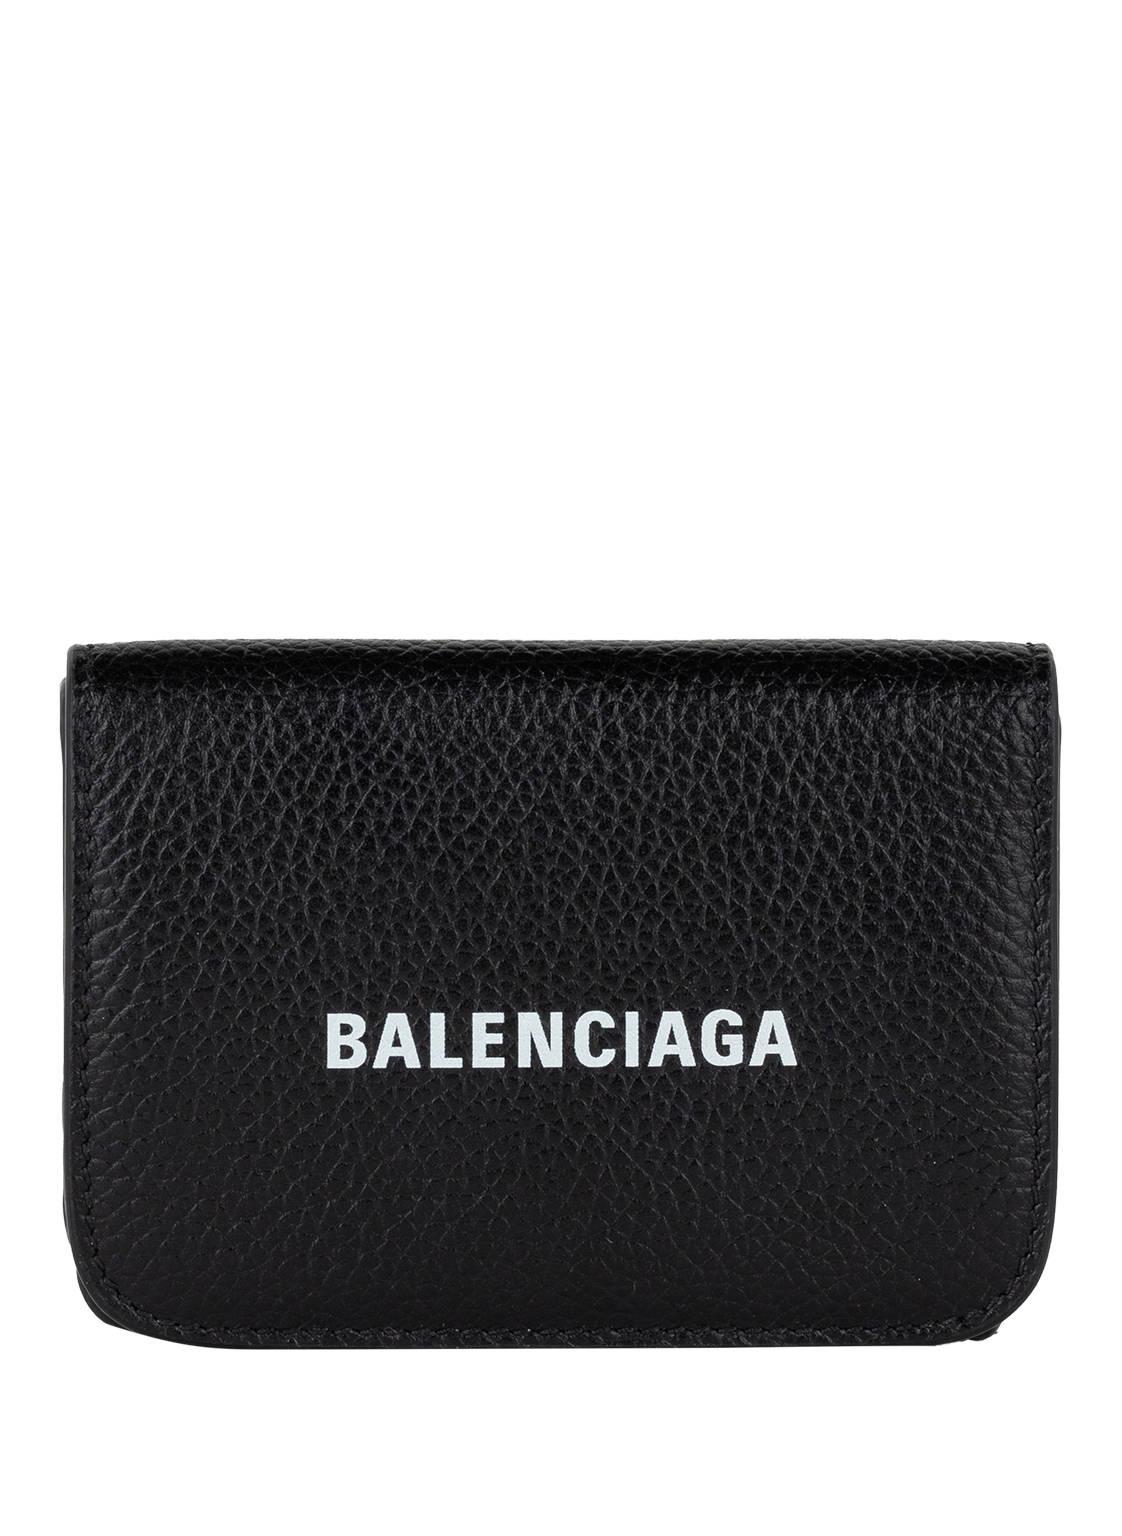 Image of Balenciaga Geldbörse Cash Mini schwarz